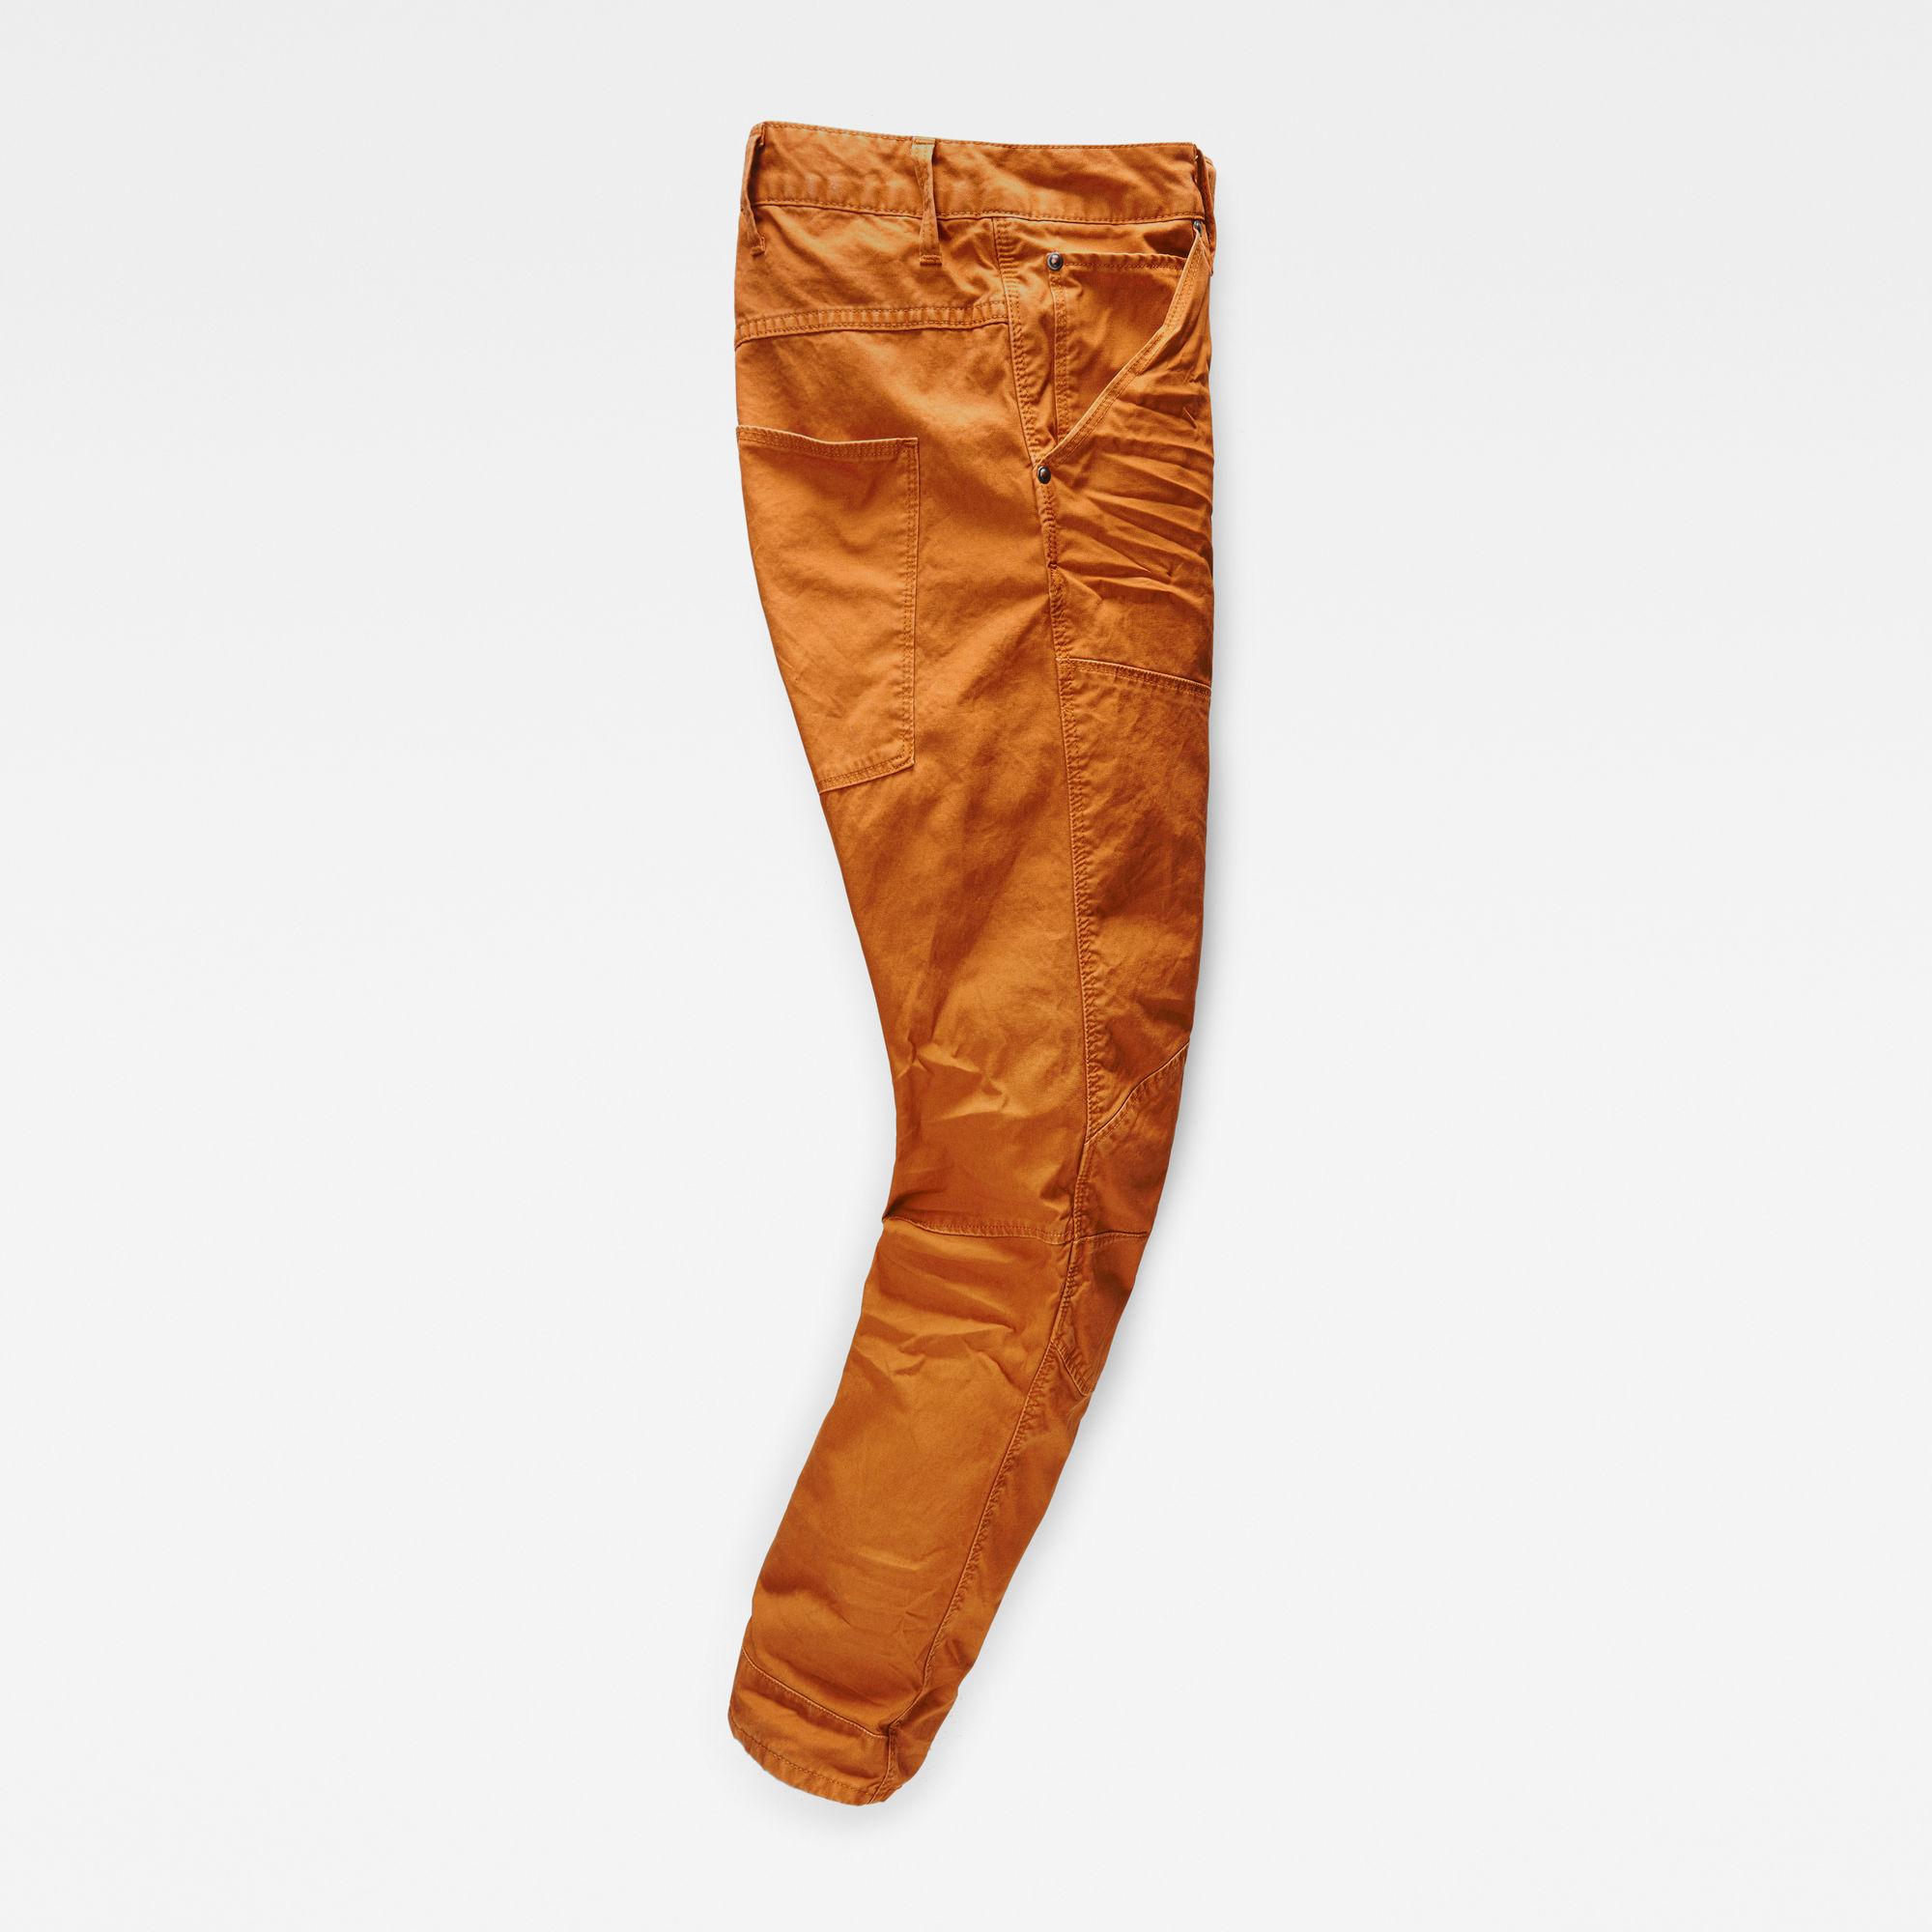 5620 G-Star Elwood 3D Loose 7/8 Pants